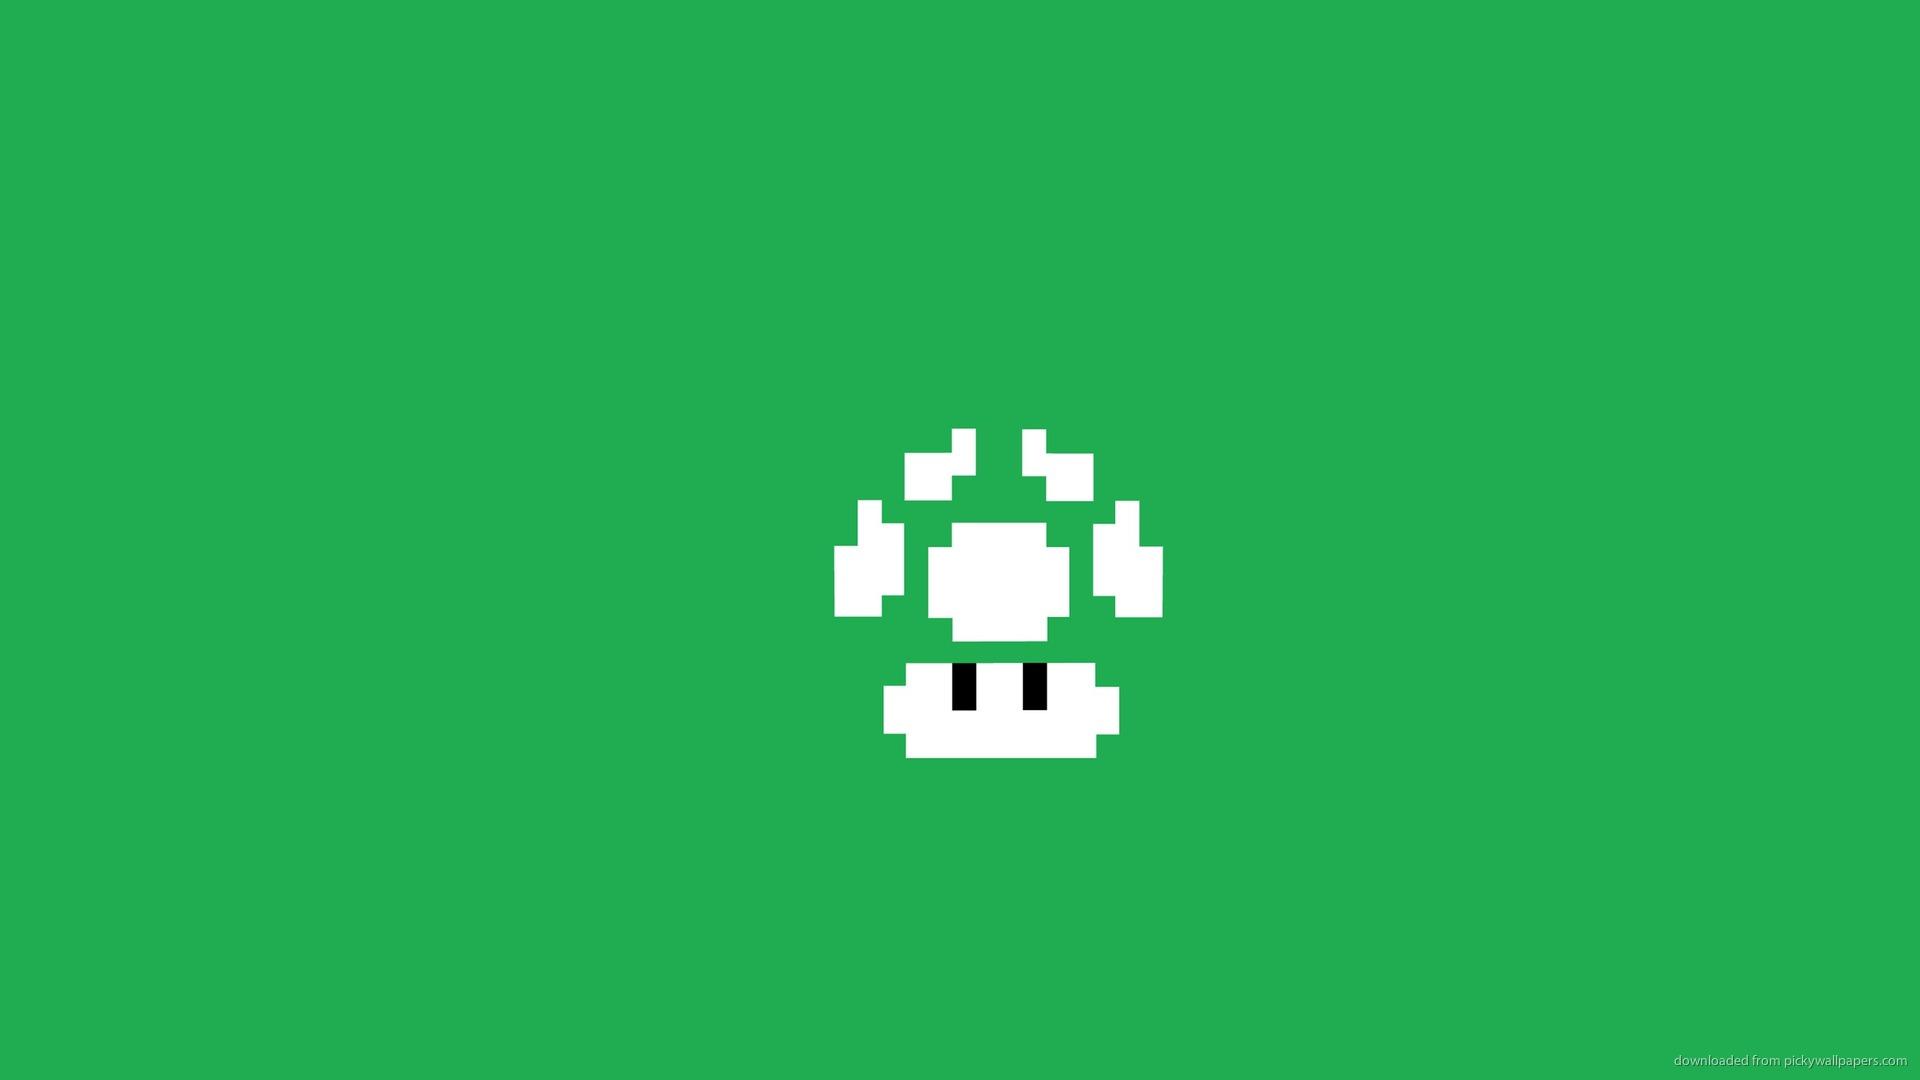 green-mushroom-for-iphone-green-mushroom-1920×1080-wallpaper-wp3406432